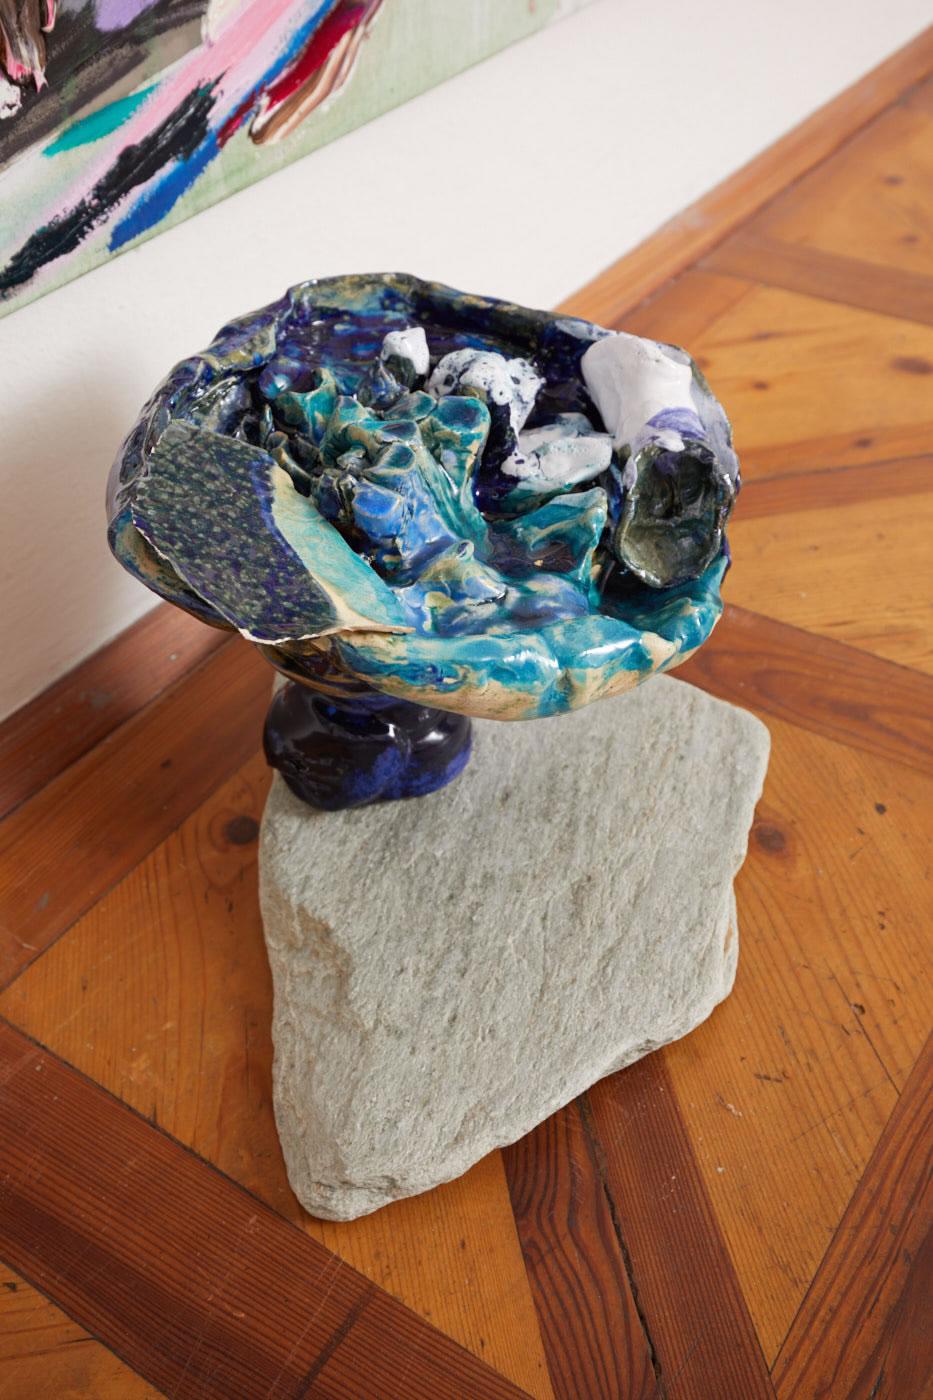 Veronika Dirnhofer | o. T. | 2018 | Keramik gebrannt | ca 40 cm | Galerie3 | Foto Johannes Puch